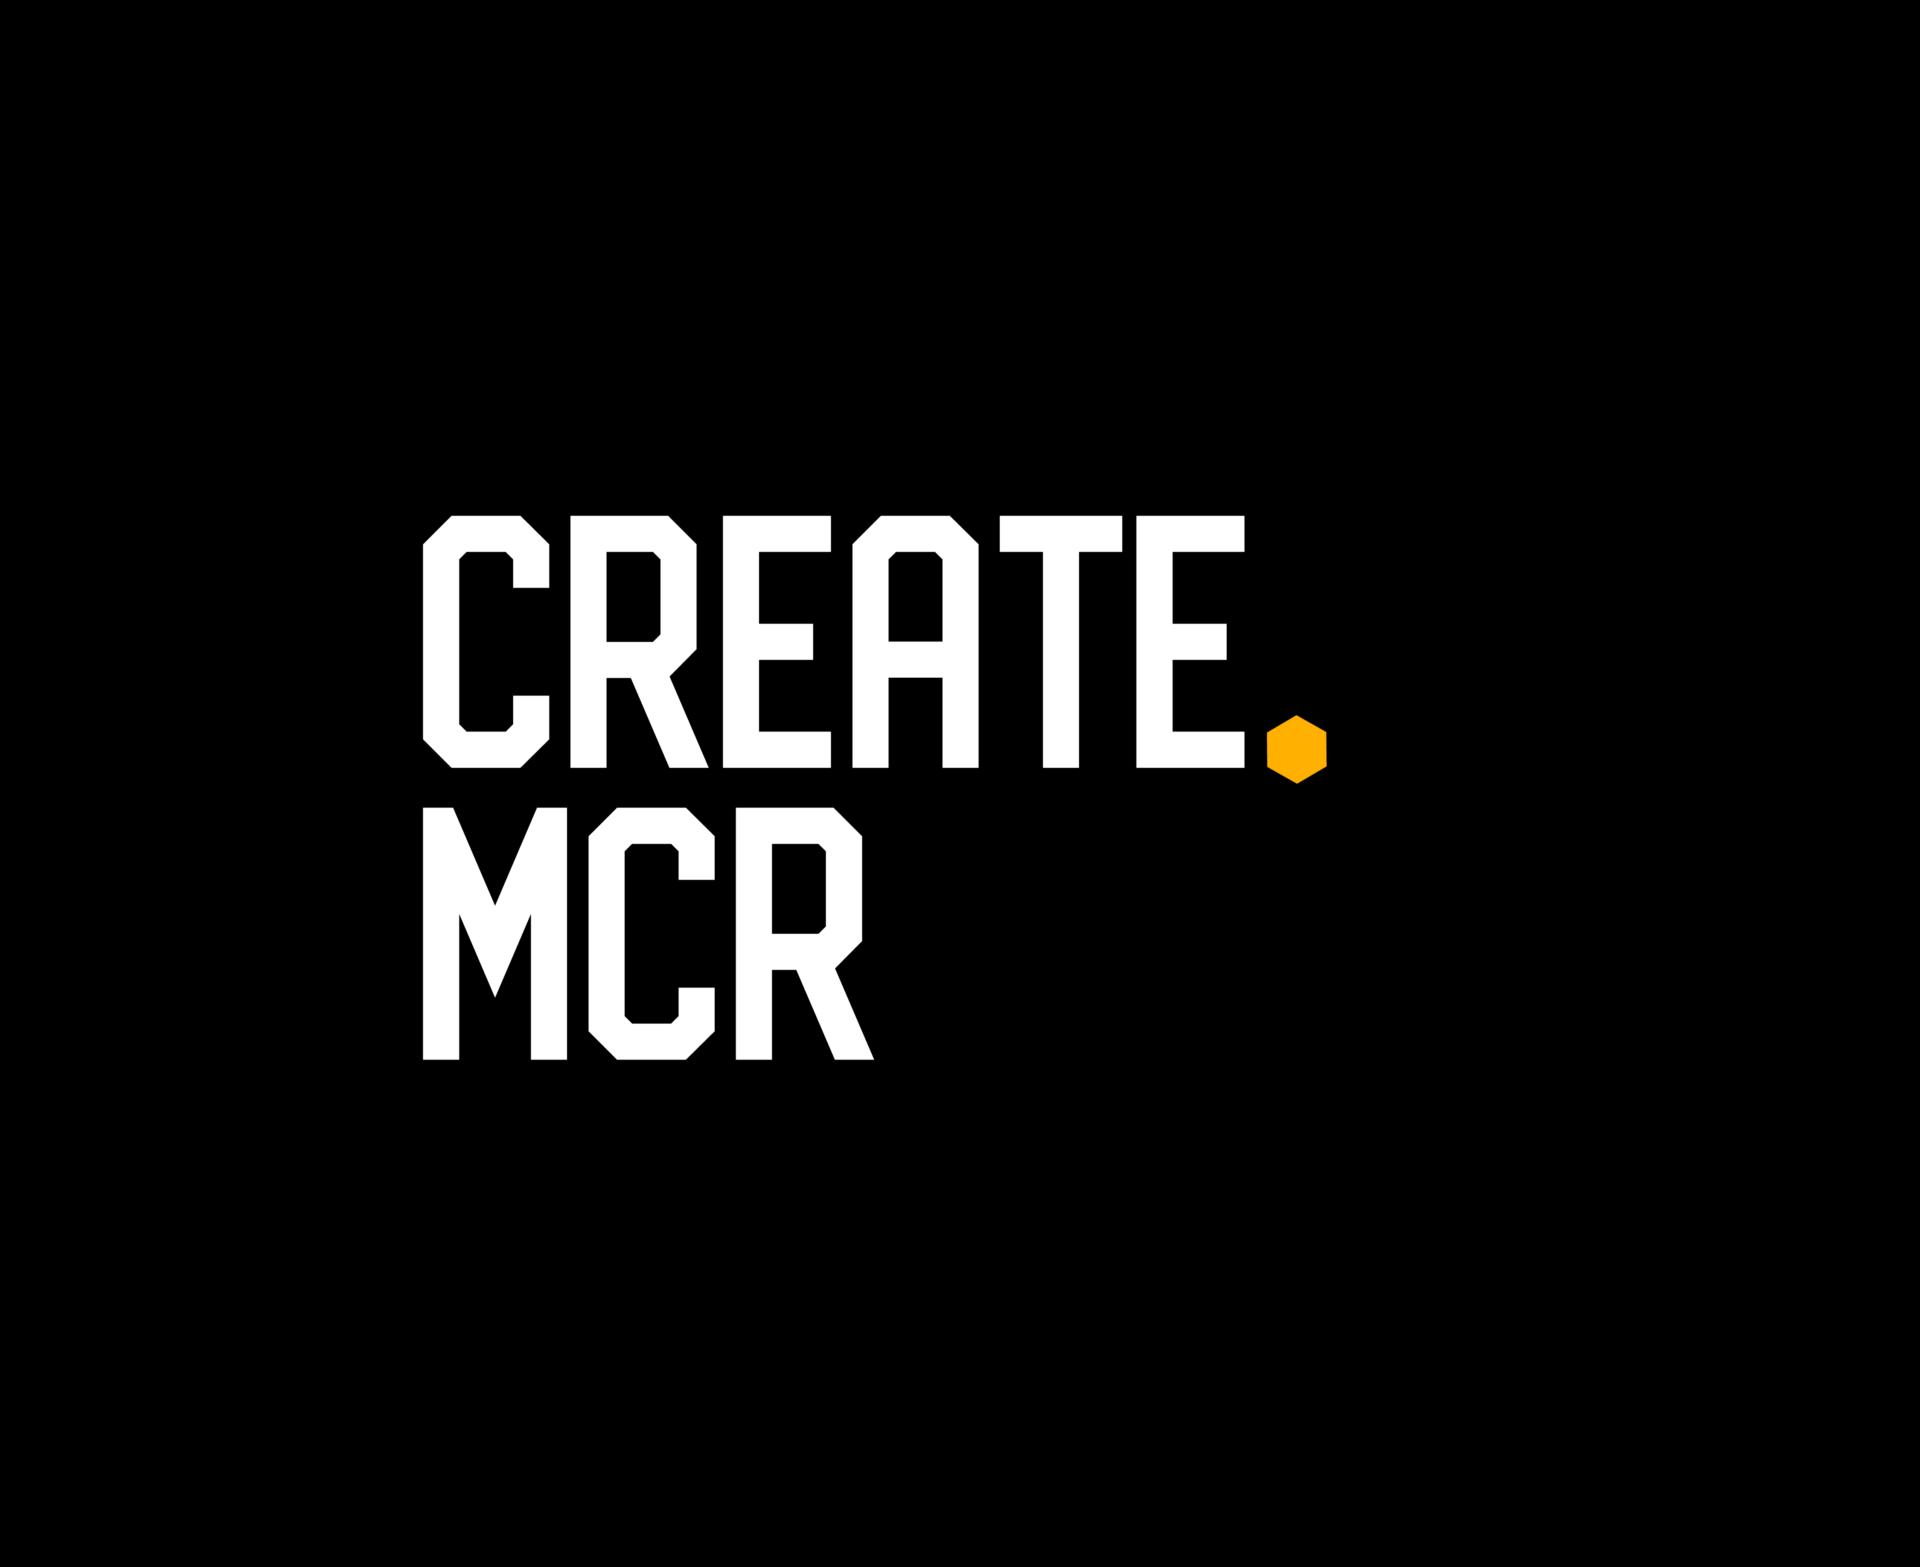 Create MCR